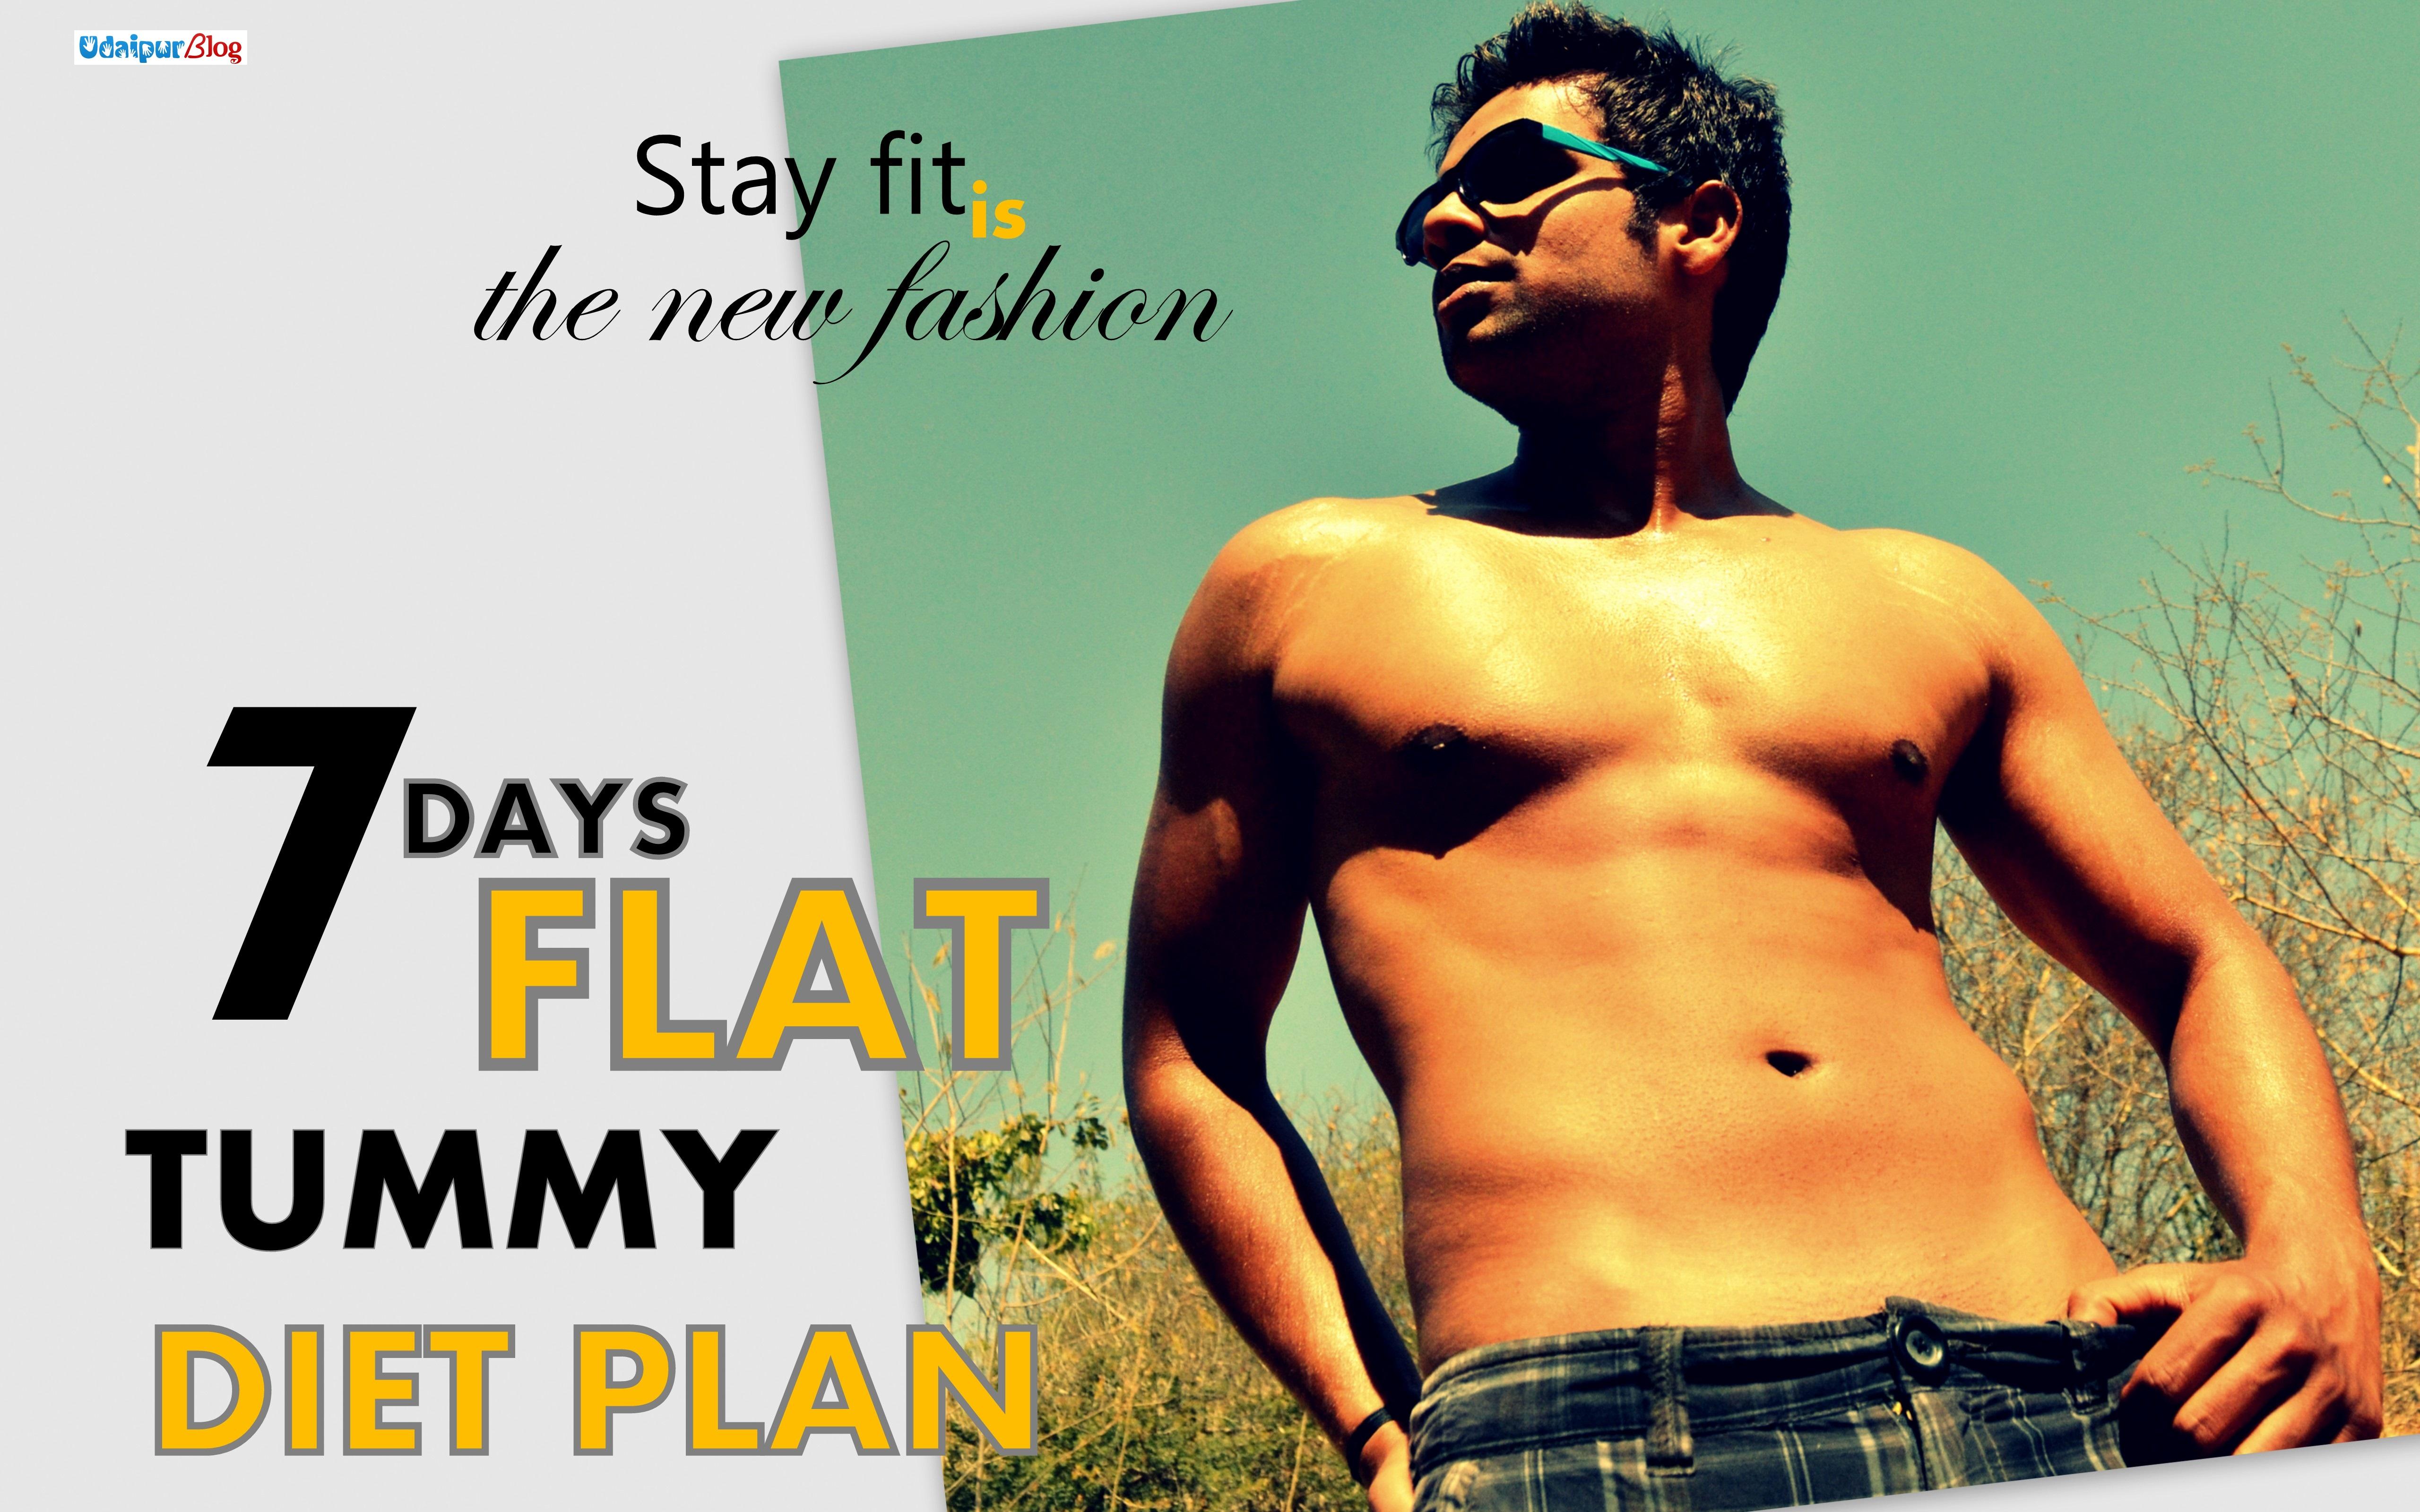 7 days for flat tummy